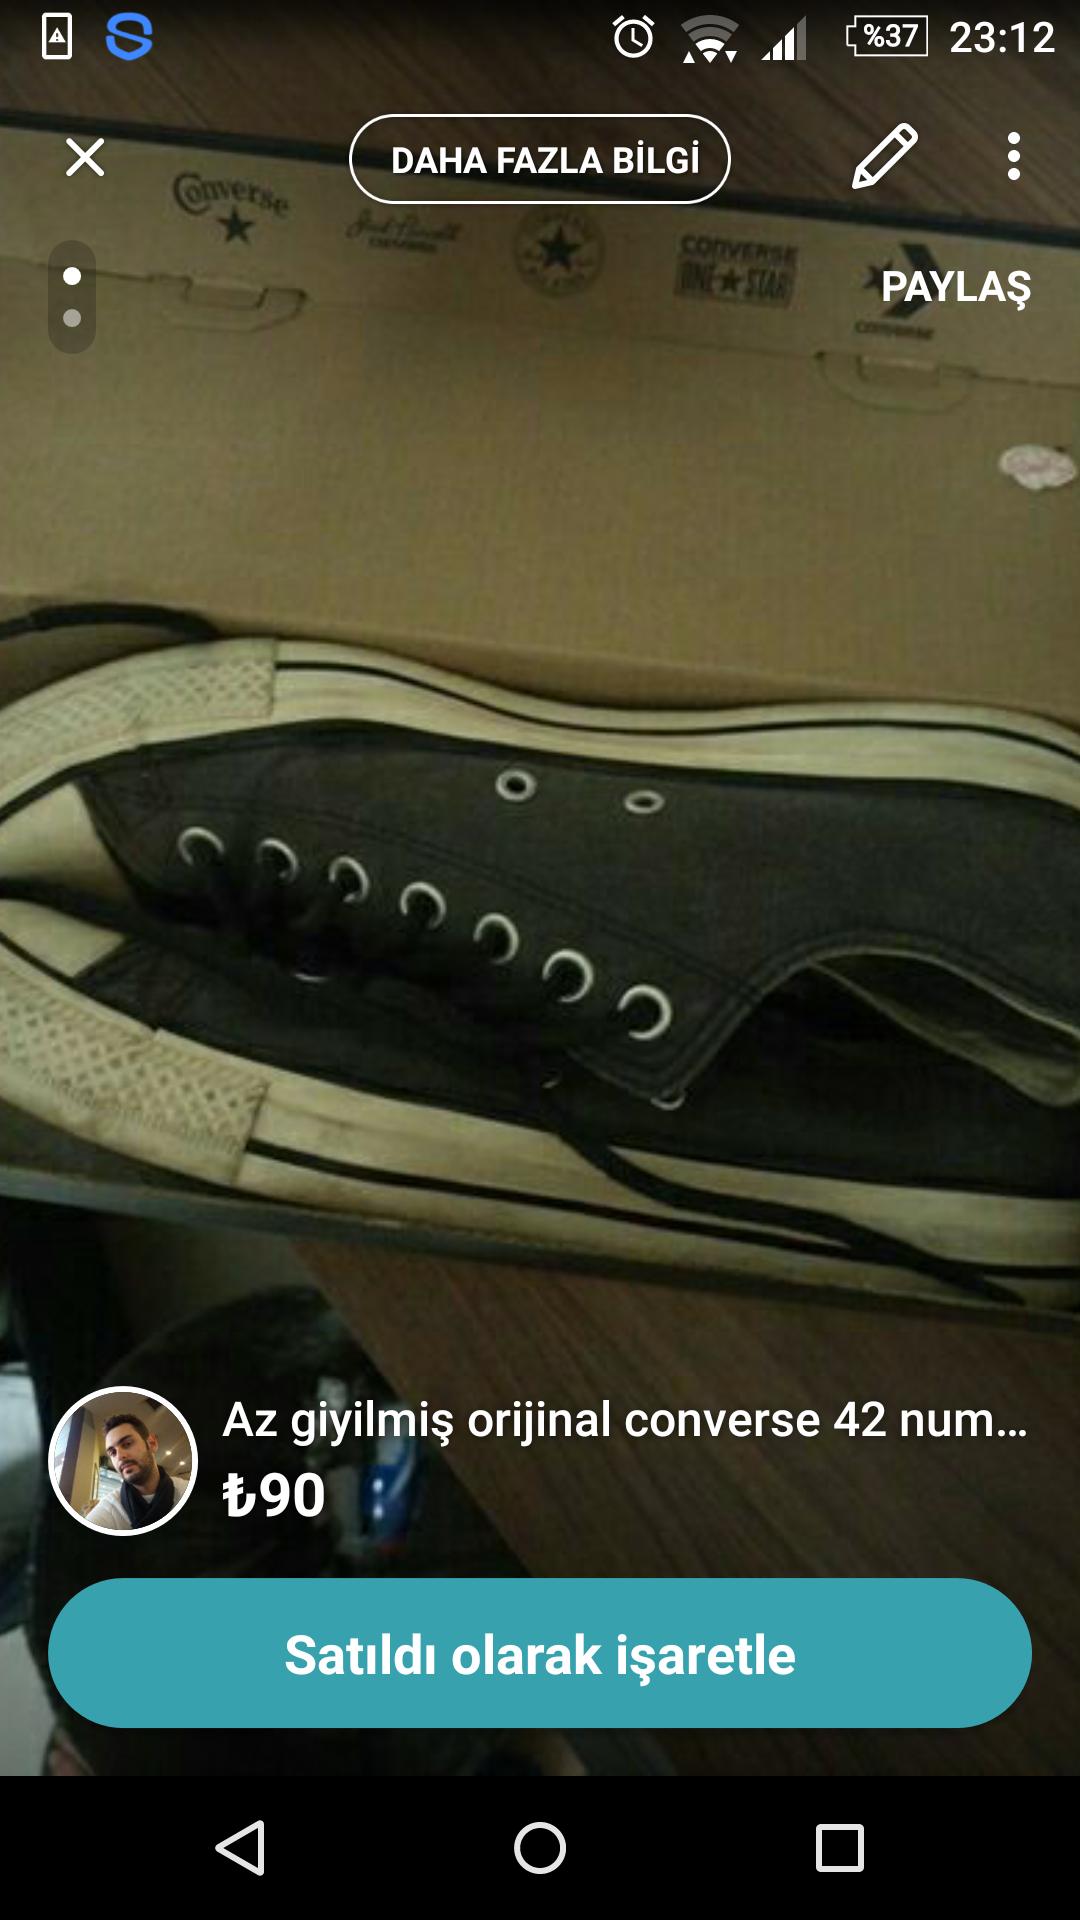 5fbb40d084f70a Orjinal converse 42 numara (az giyilmiş) » Sayfa 1 - 0